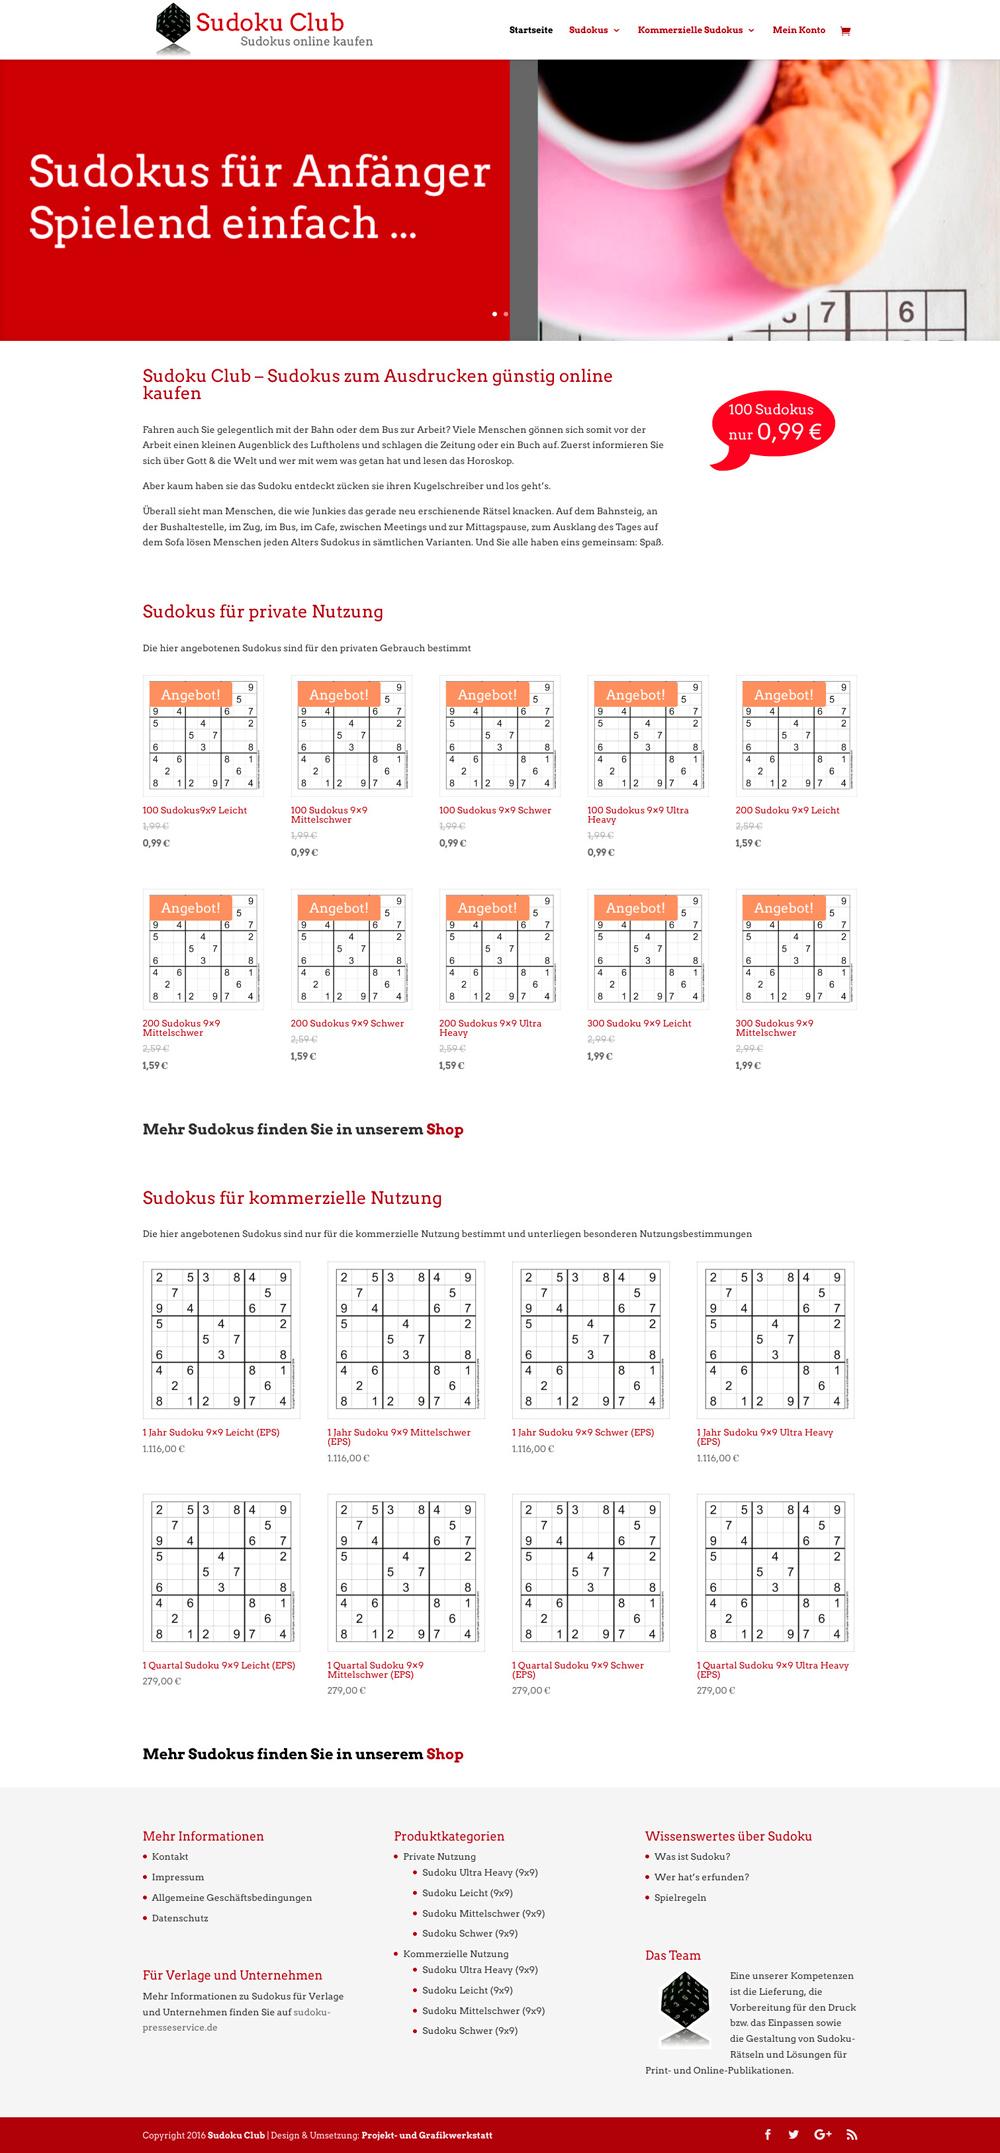 PUG eröffnet Sudoku Club | Projekt- und Grafikwerkstatt